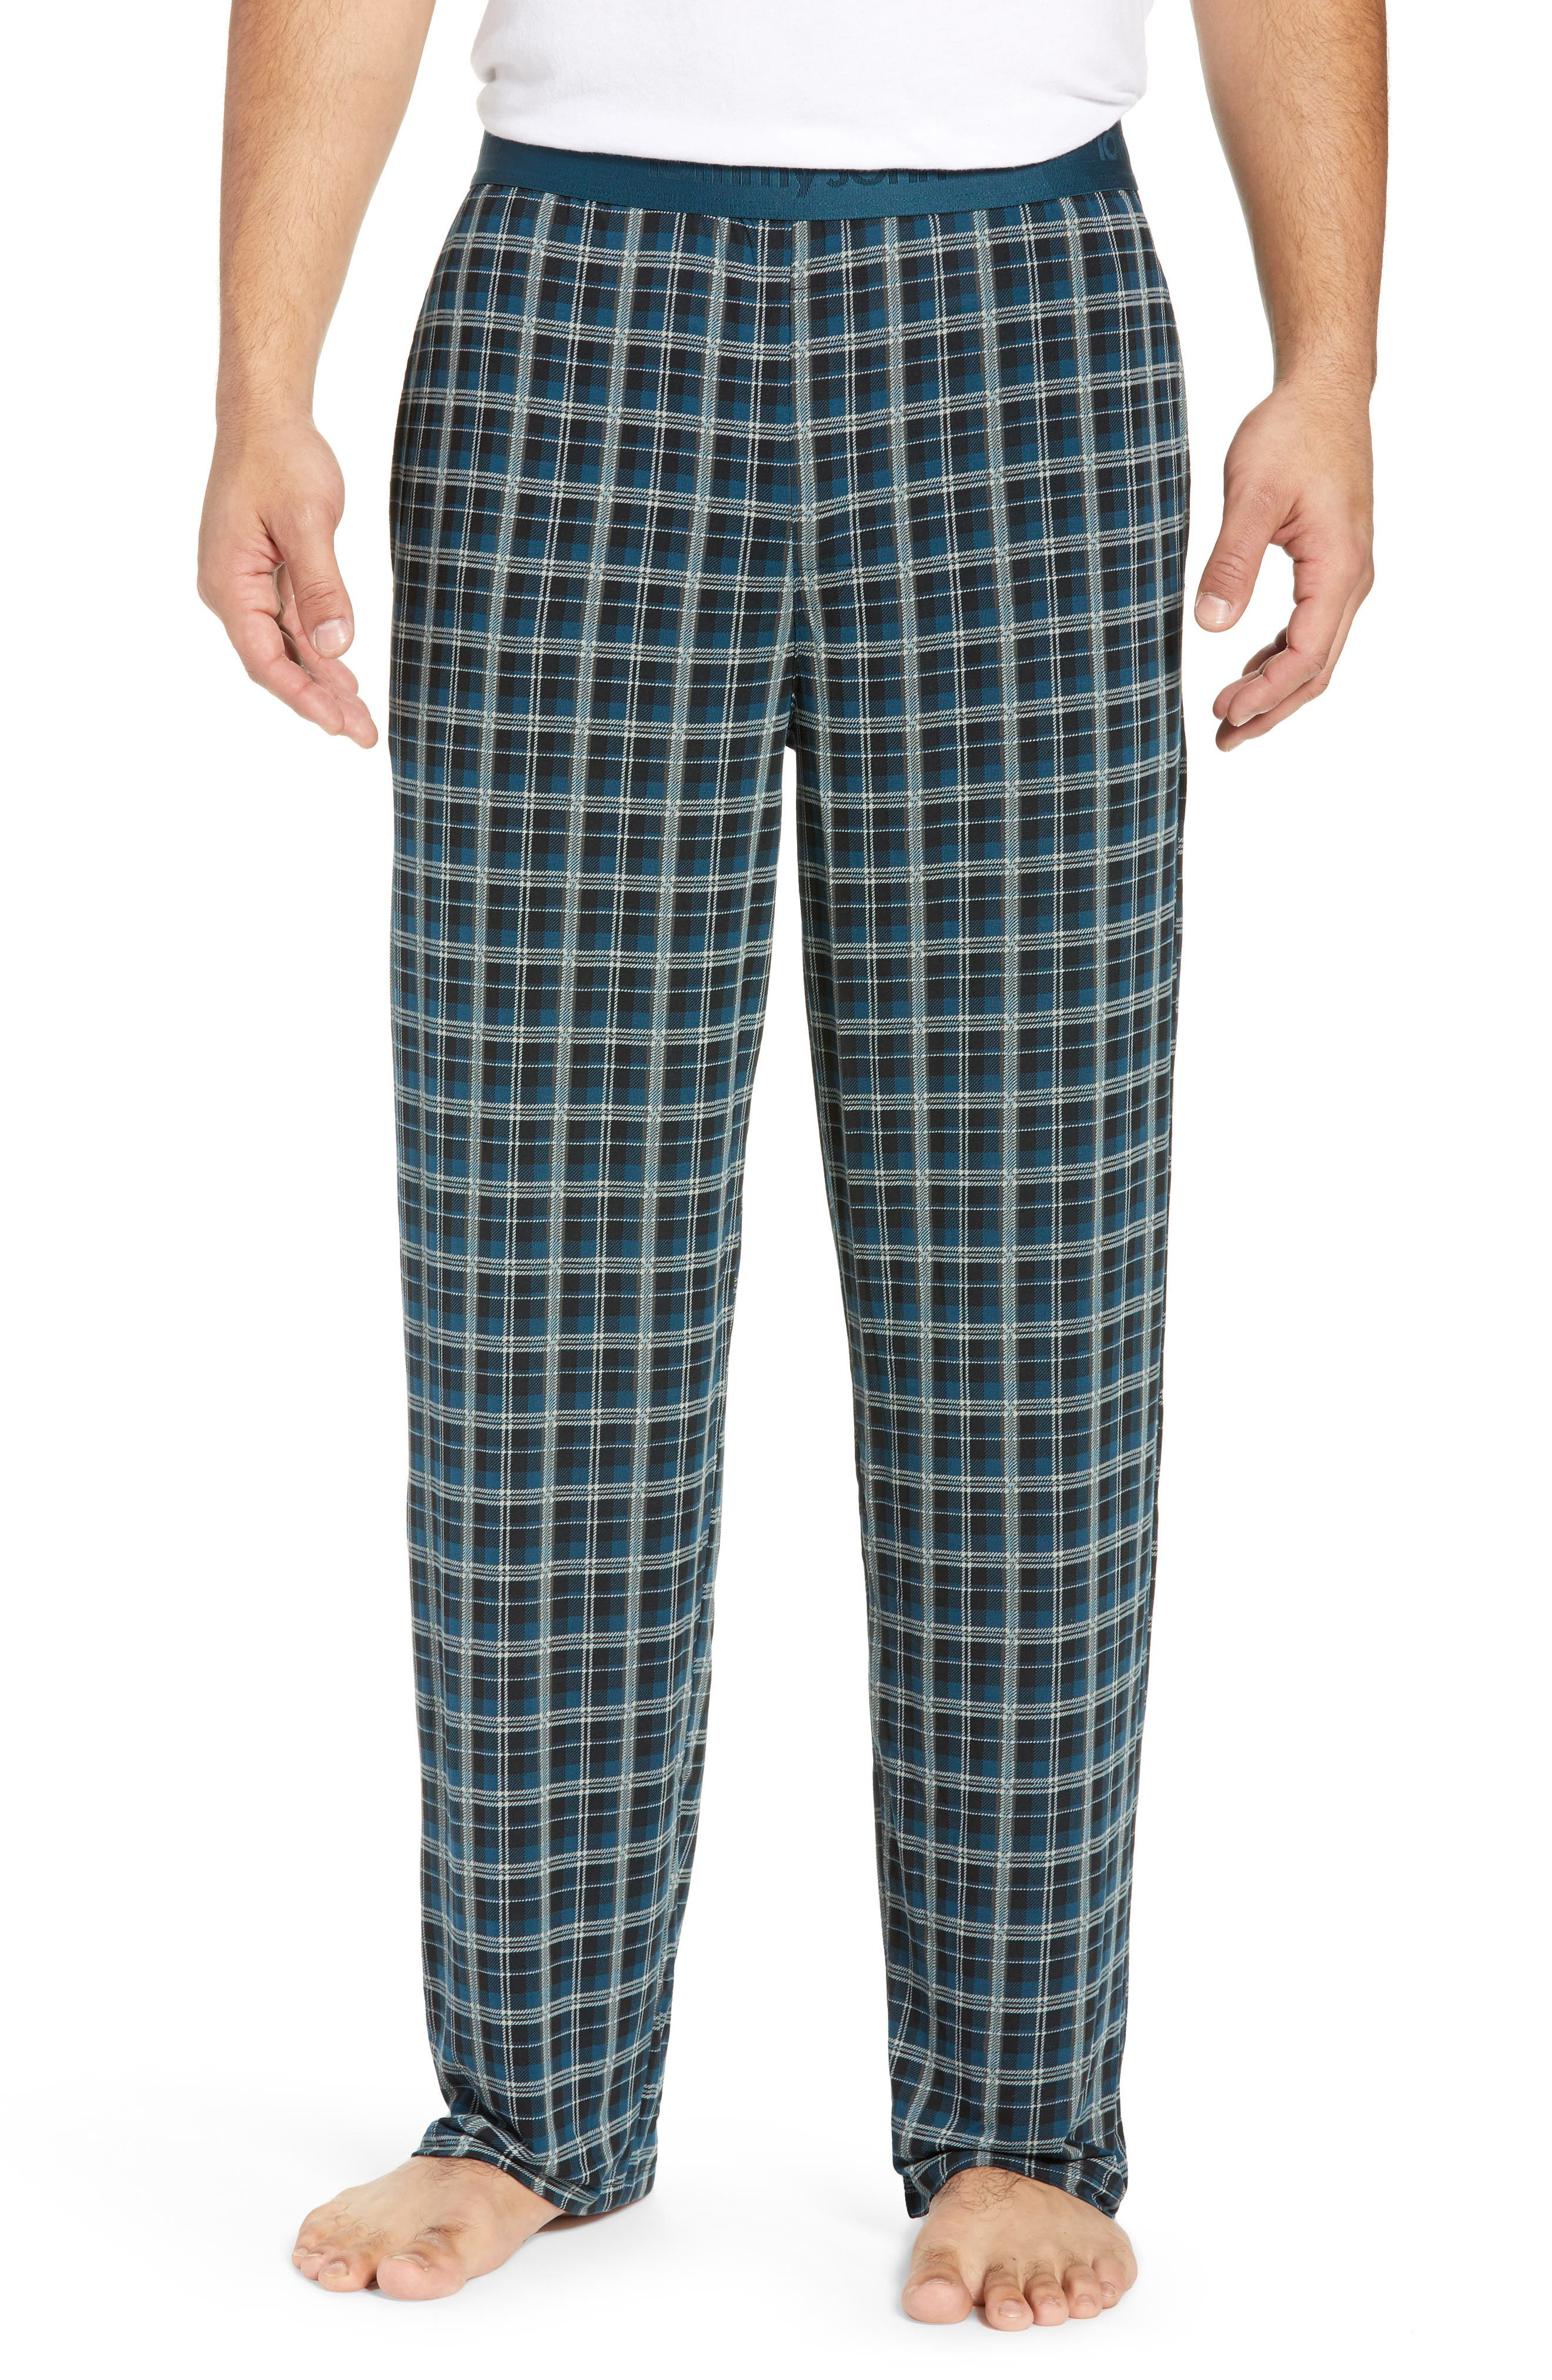 Second Skin Stretch Modal Pajama Pants,                         Main,                         color, REFLECTING POND PLAID